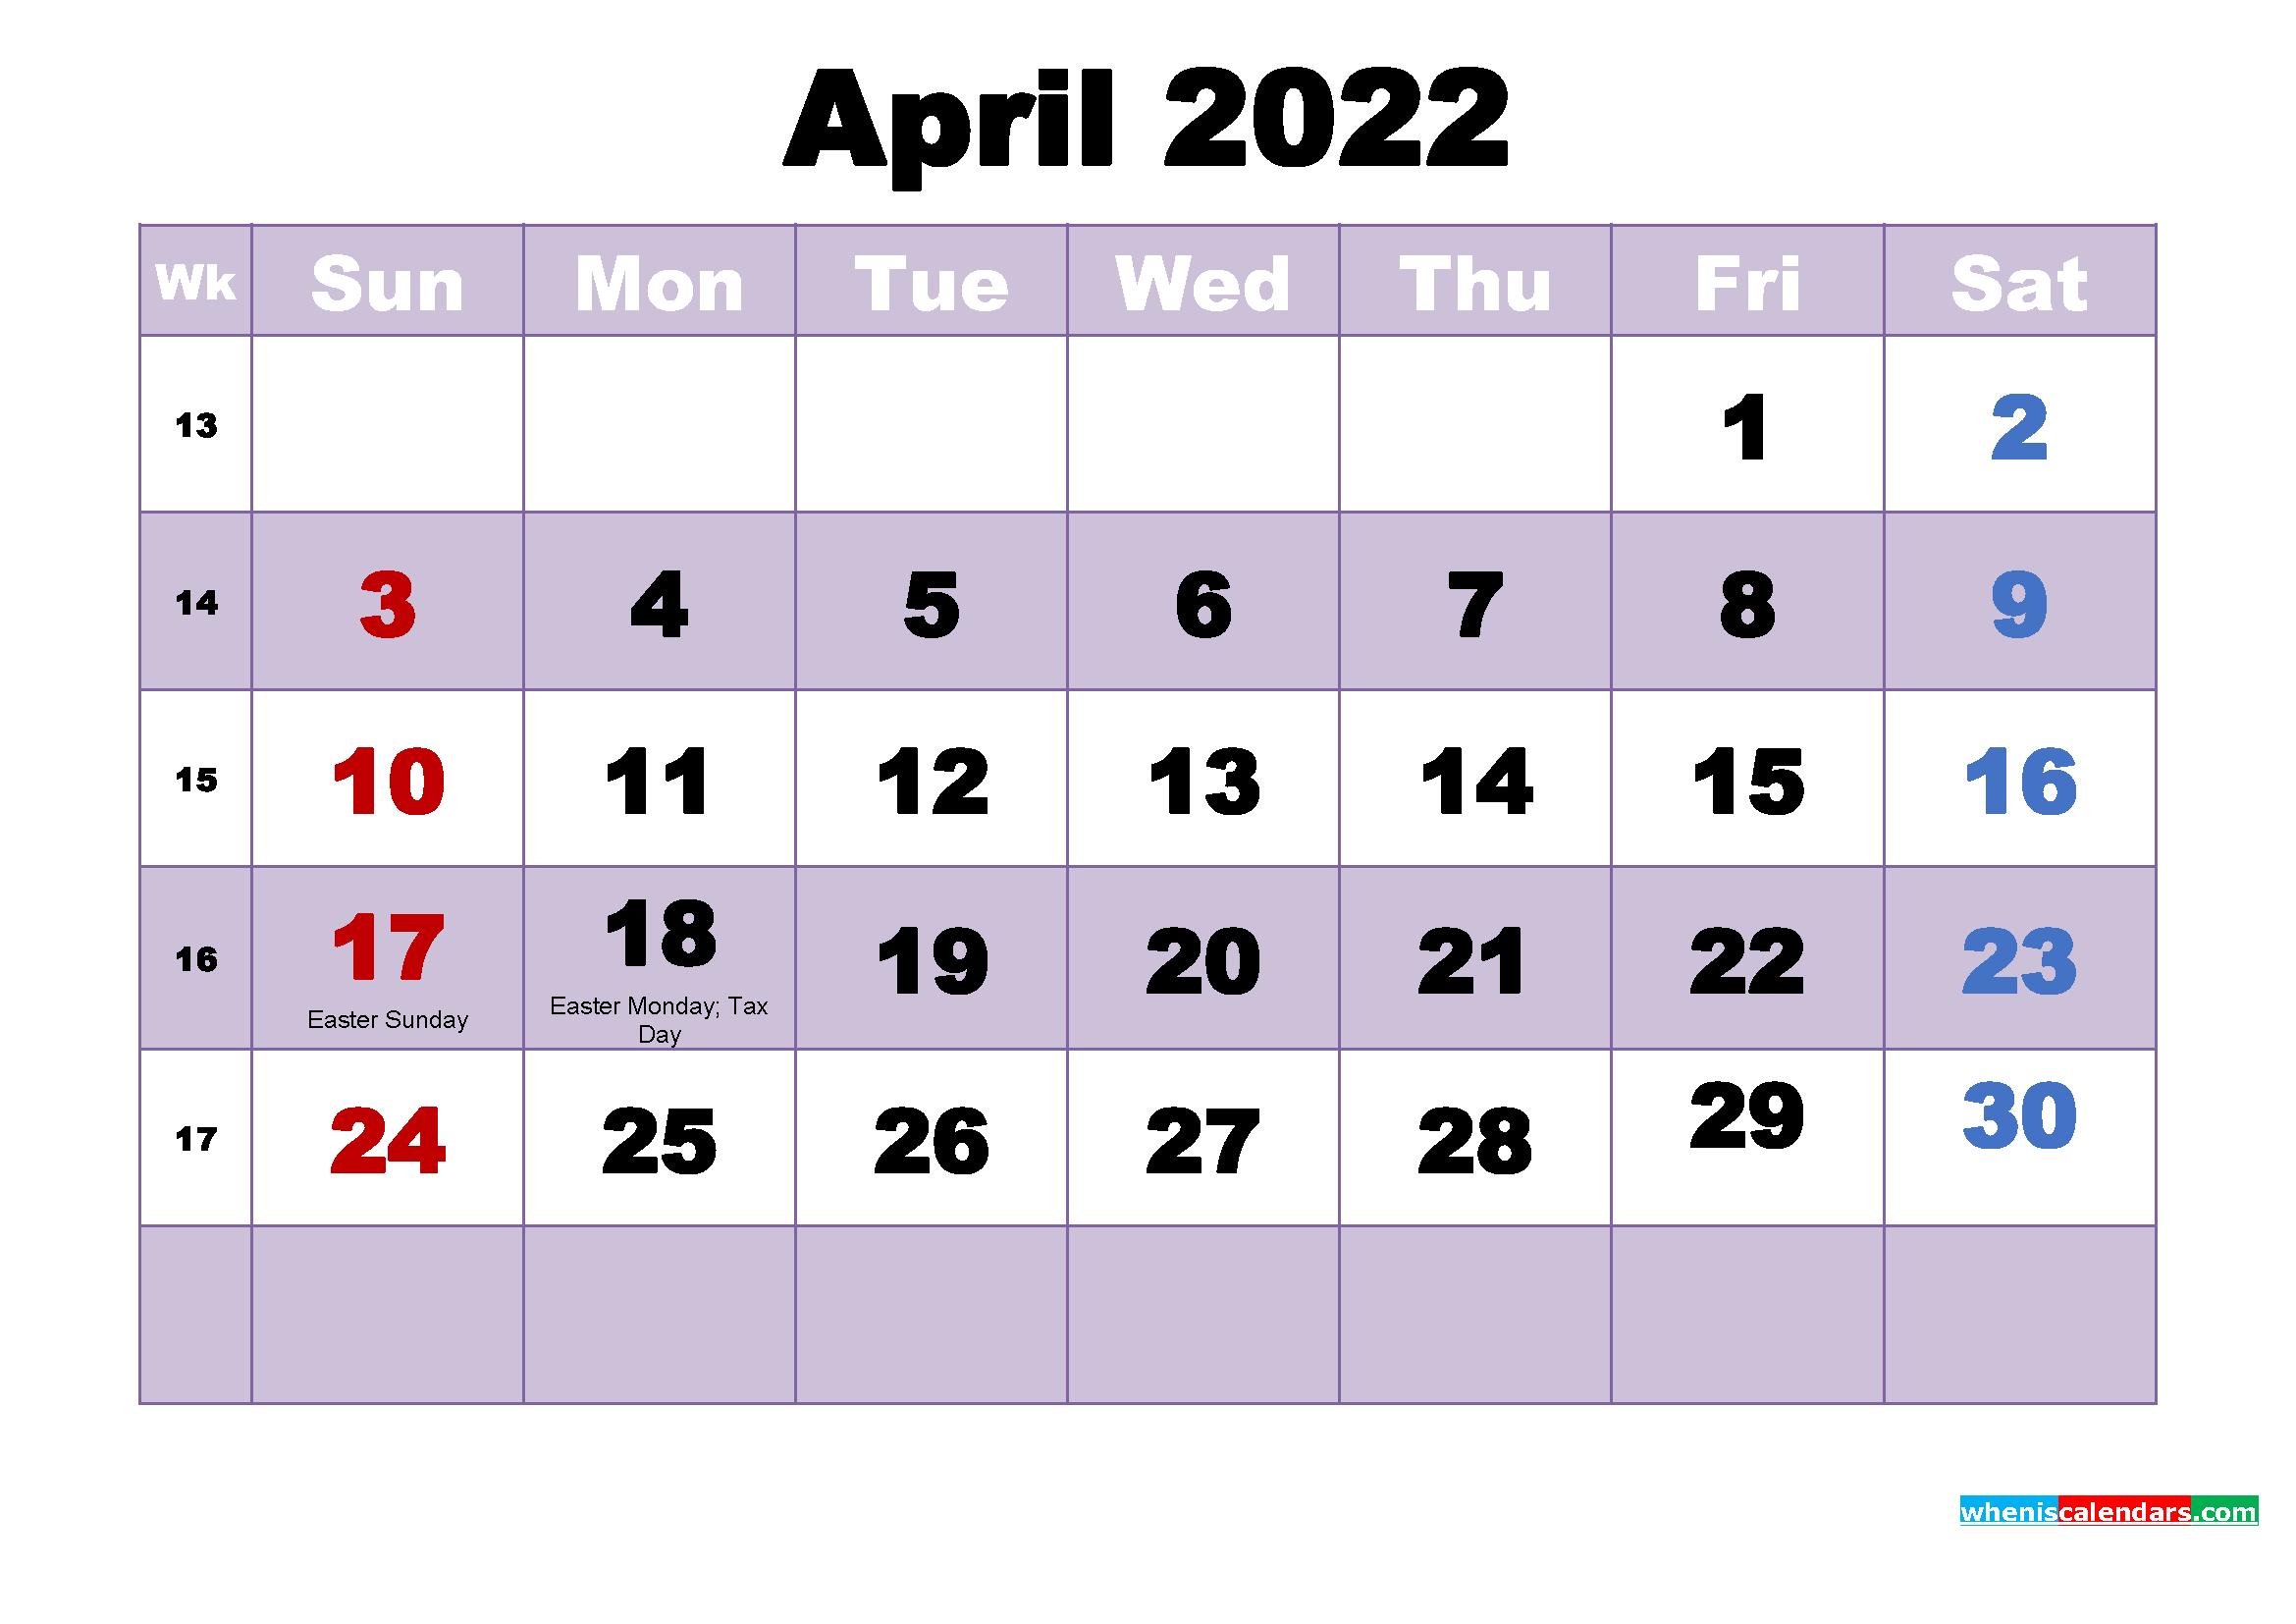 April 2022 Calendar Wallpaper Free Download